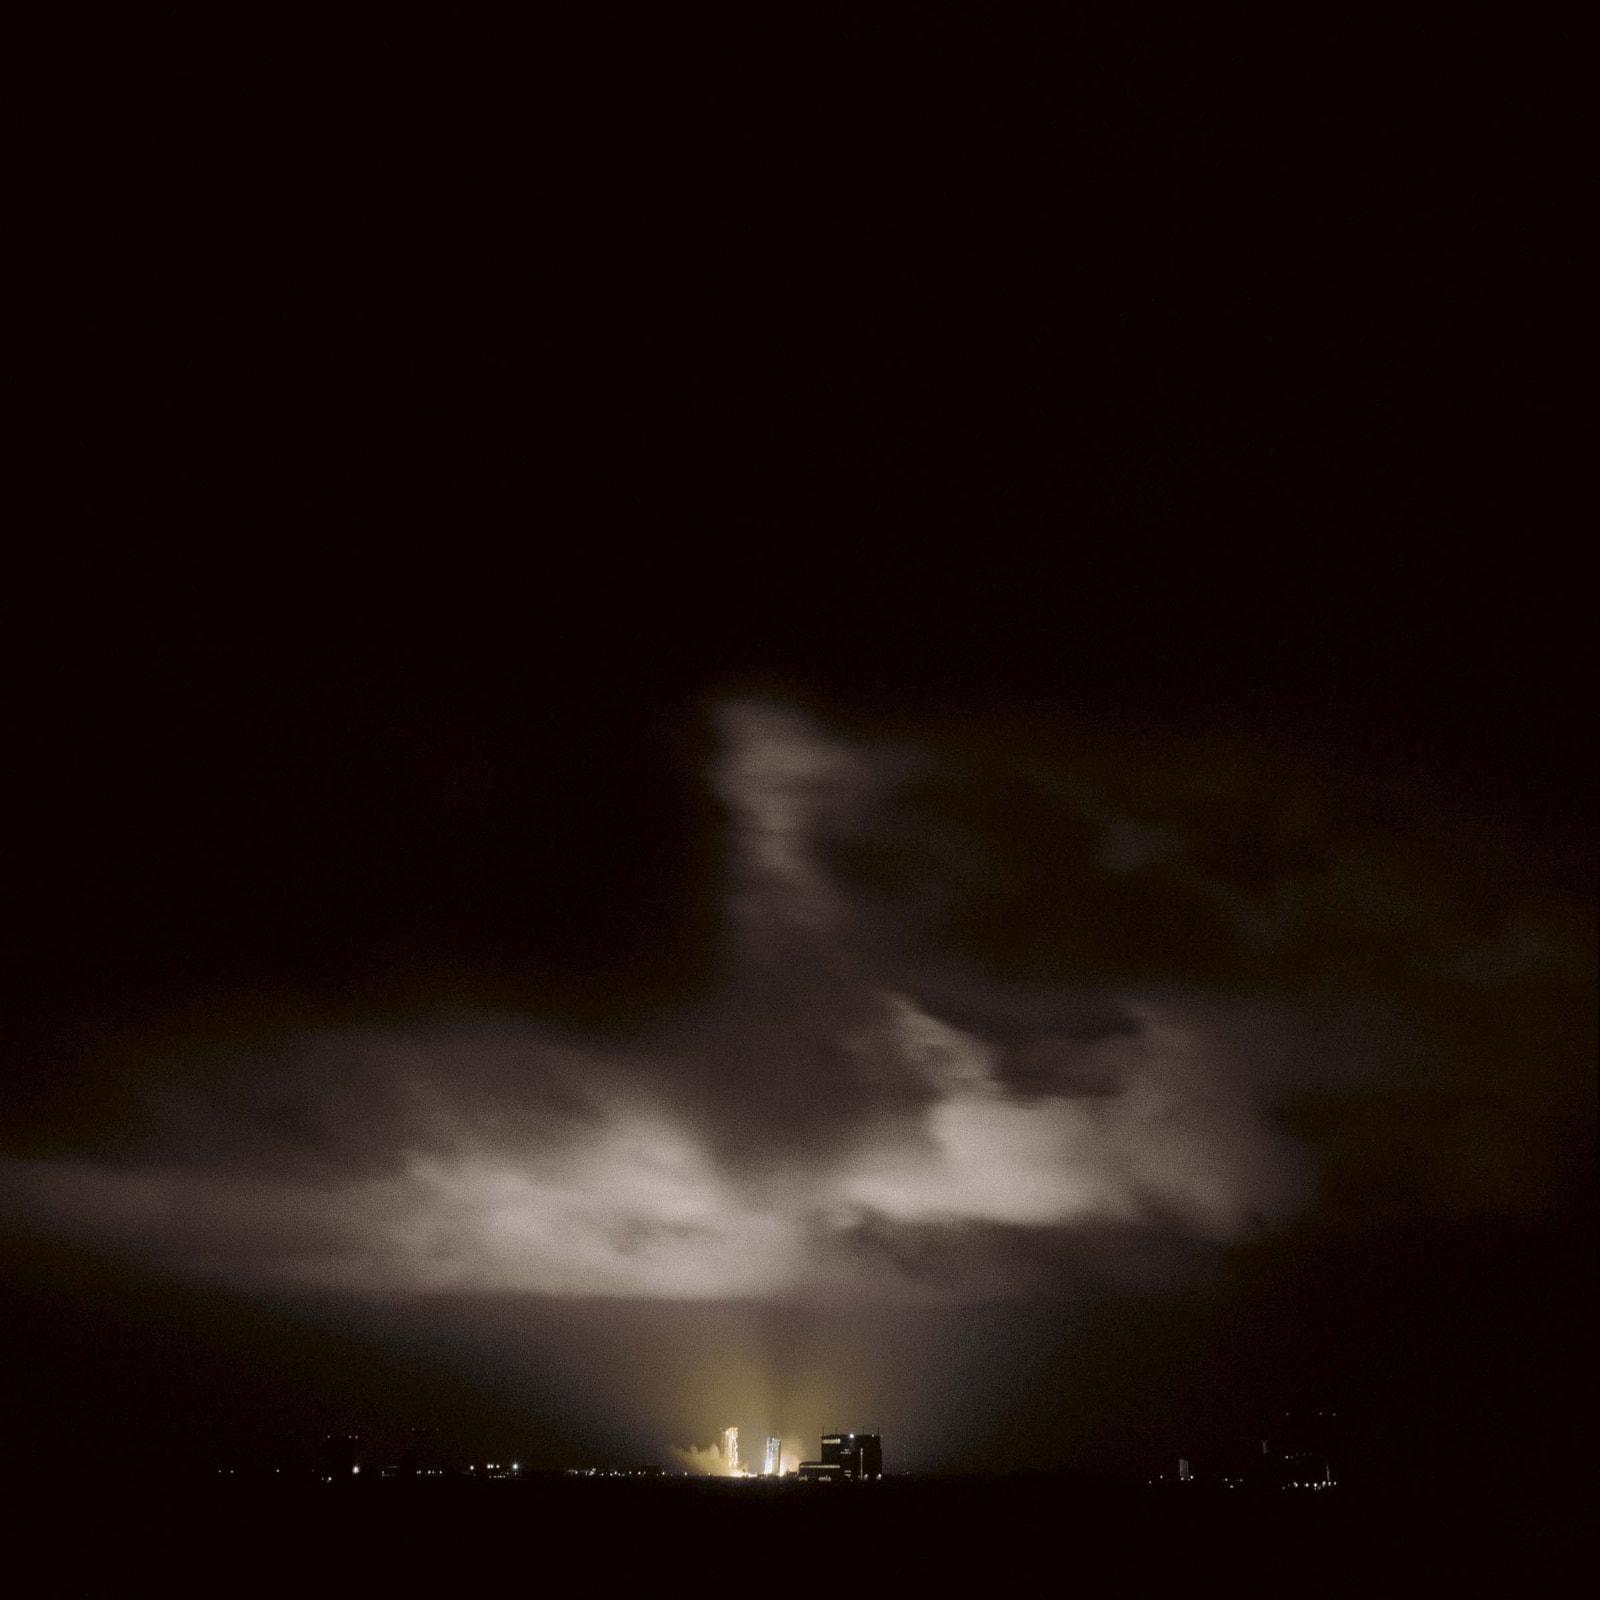 Launch, Arianespace, Ariane IV, Kourou, French Guiana by Lynn Davis